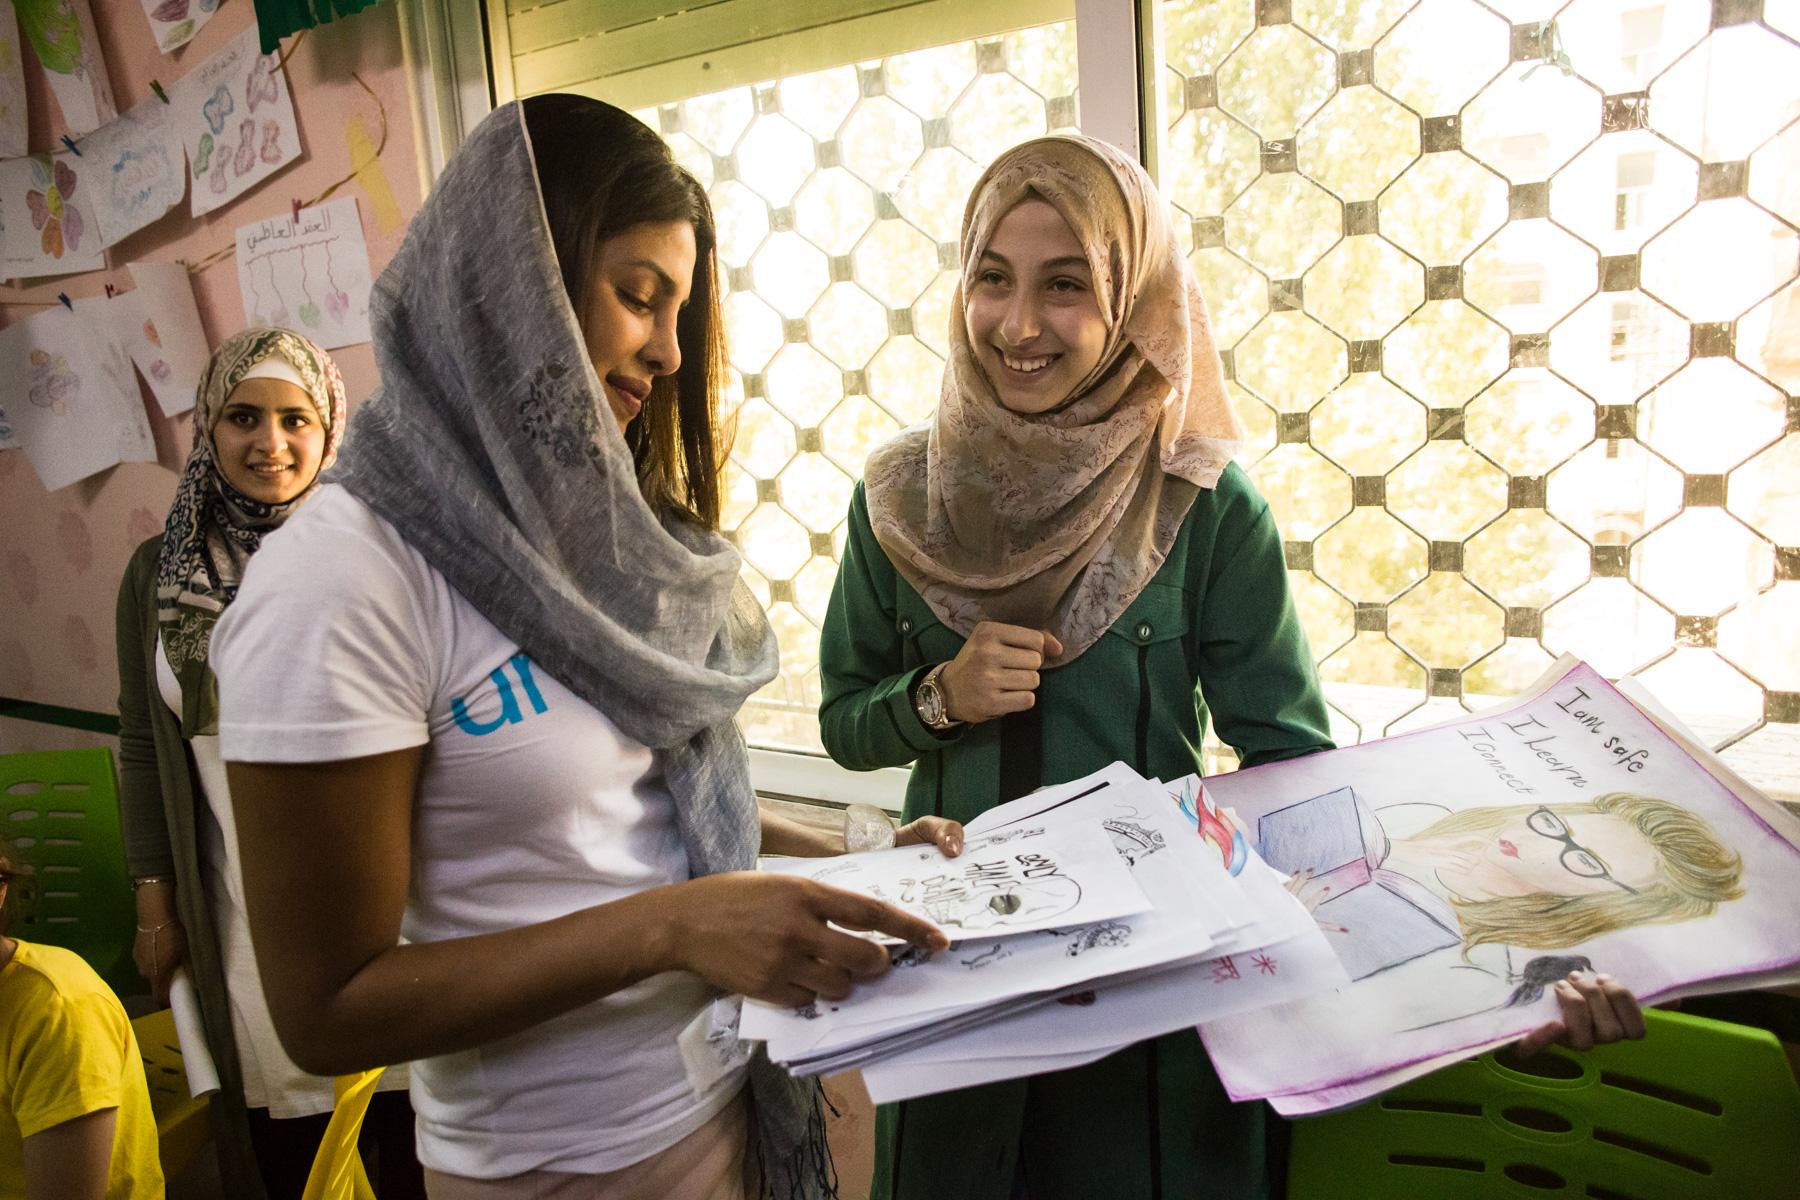 Priyanka Chopra, a UNICEF Goodwill Ambassador, views artwork by Eman Ahmad (right), 15, from Aleppo, at UNICEF's Makani Center in Amman, Jordan, on Sunday, Sep. 10, 2017. (AP Photo/Lindsey Leger)